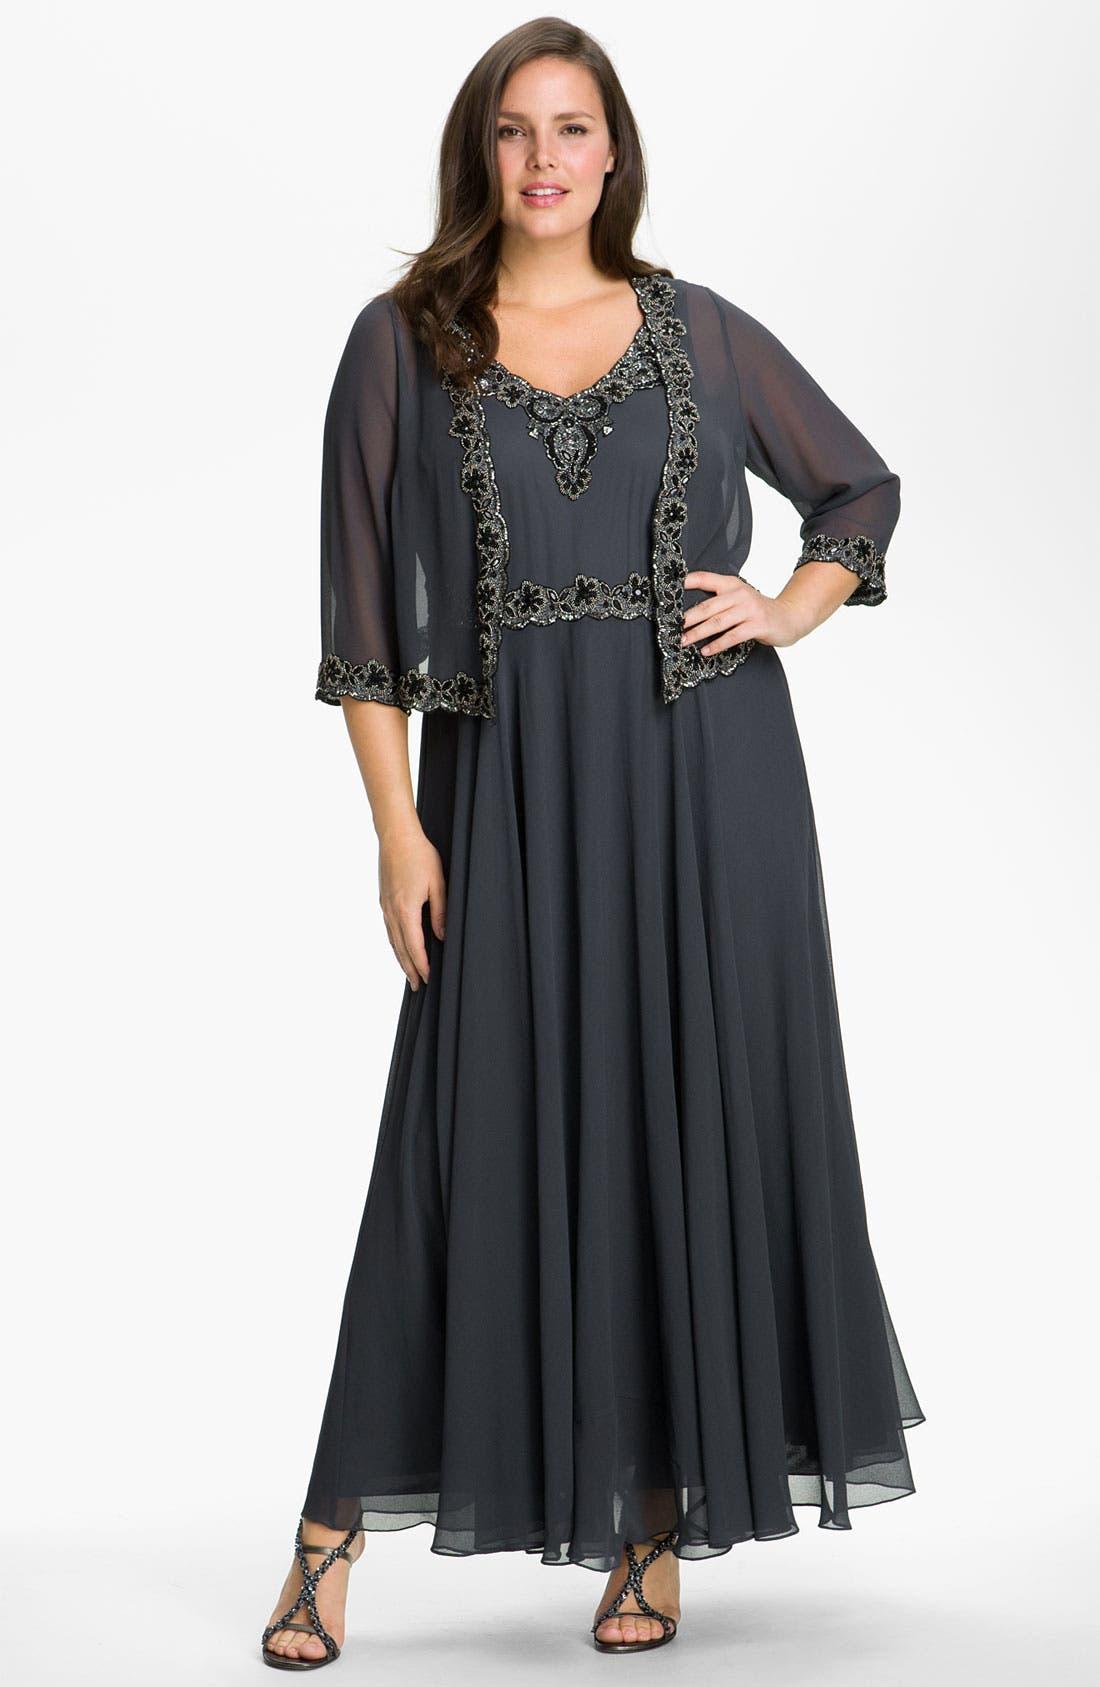 Alternate Image 1 Selected - J Kara Beaded Chiffon Gown & Jacket (Plus Size)